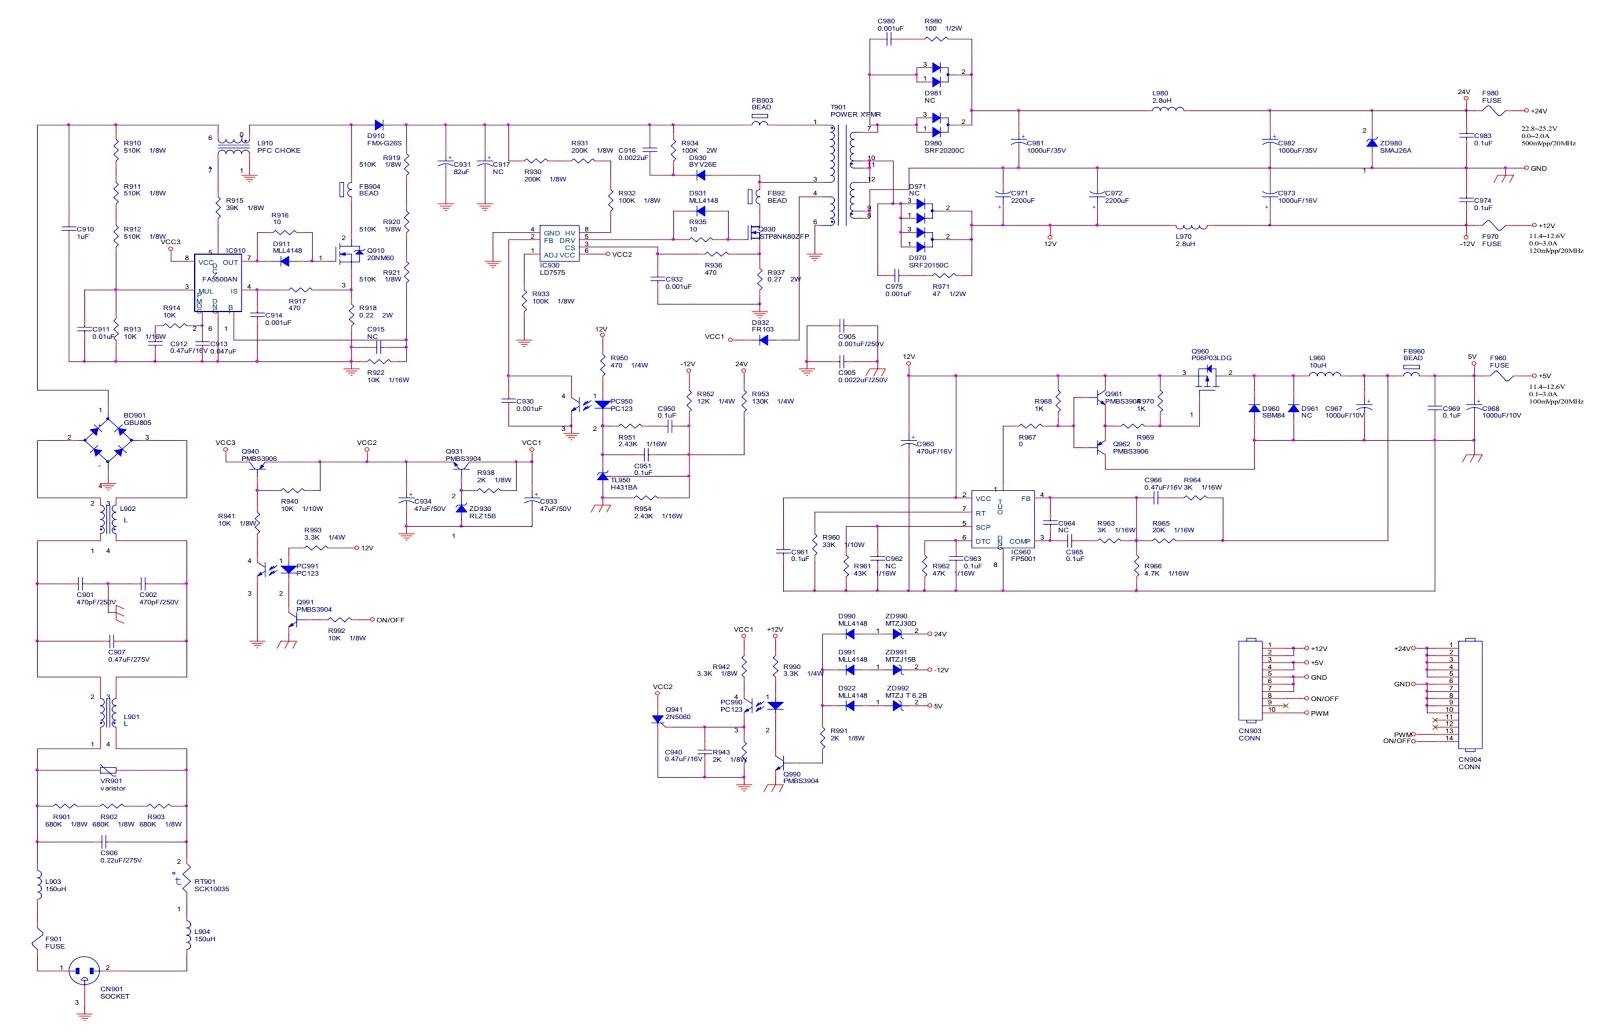 Electro Help  Viewsonic N2060w Power Board 715t 1599